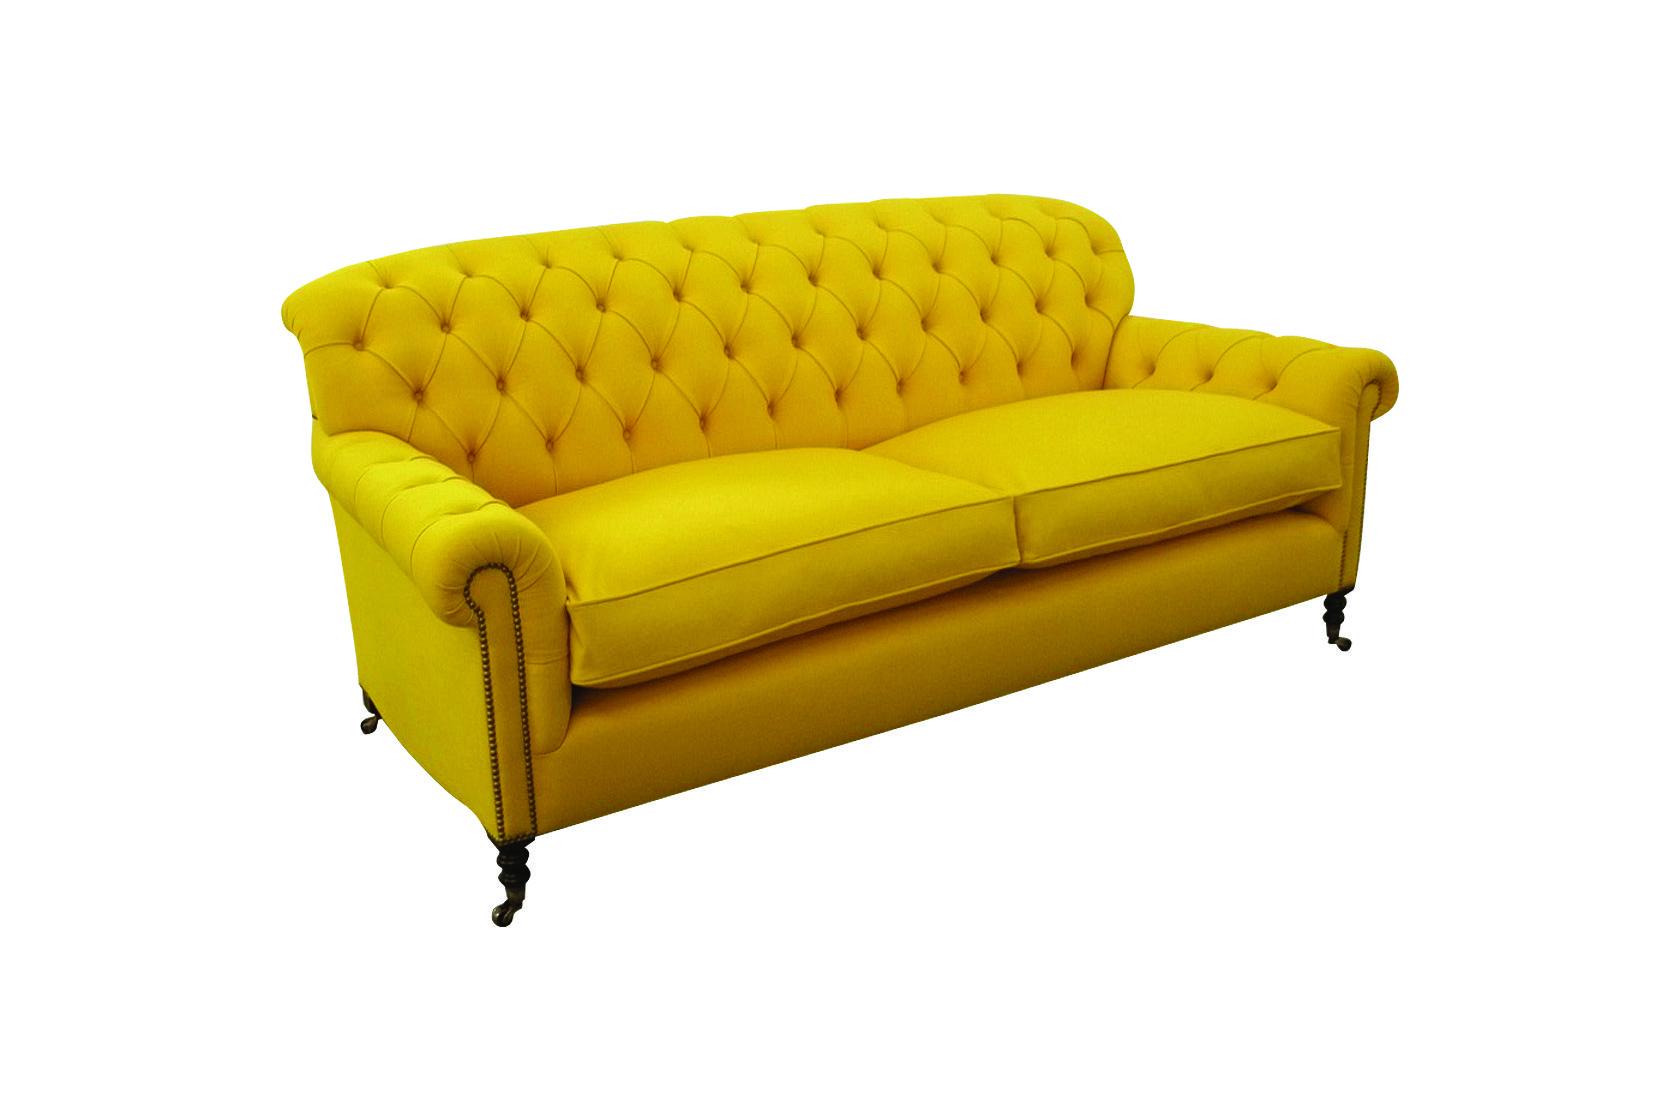 George Smith Bulgari Sofa Covered In Hainsworth Cloth Sofa Sofa Covers Home Deco